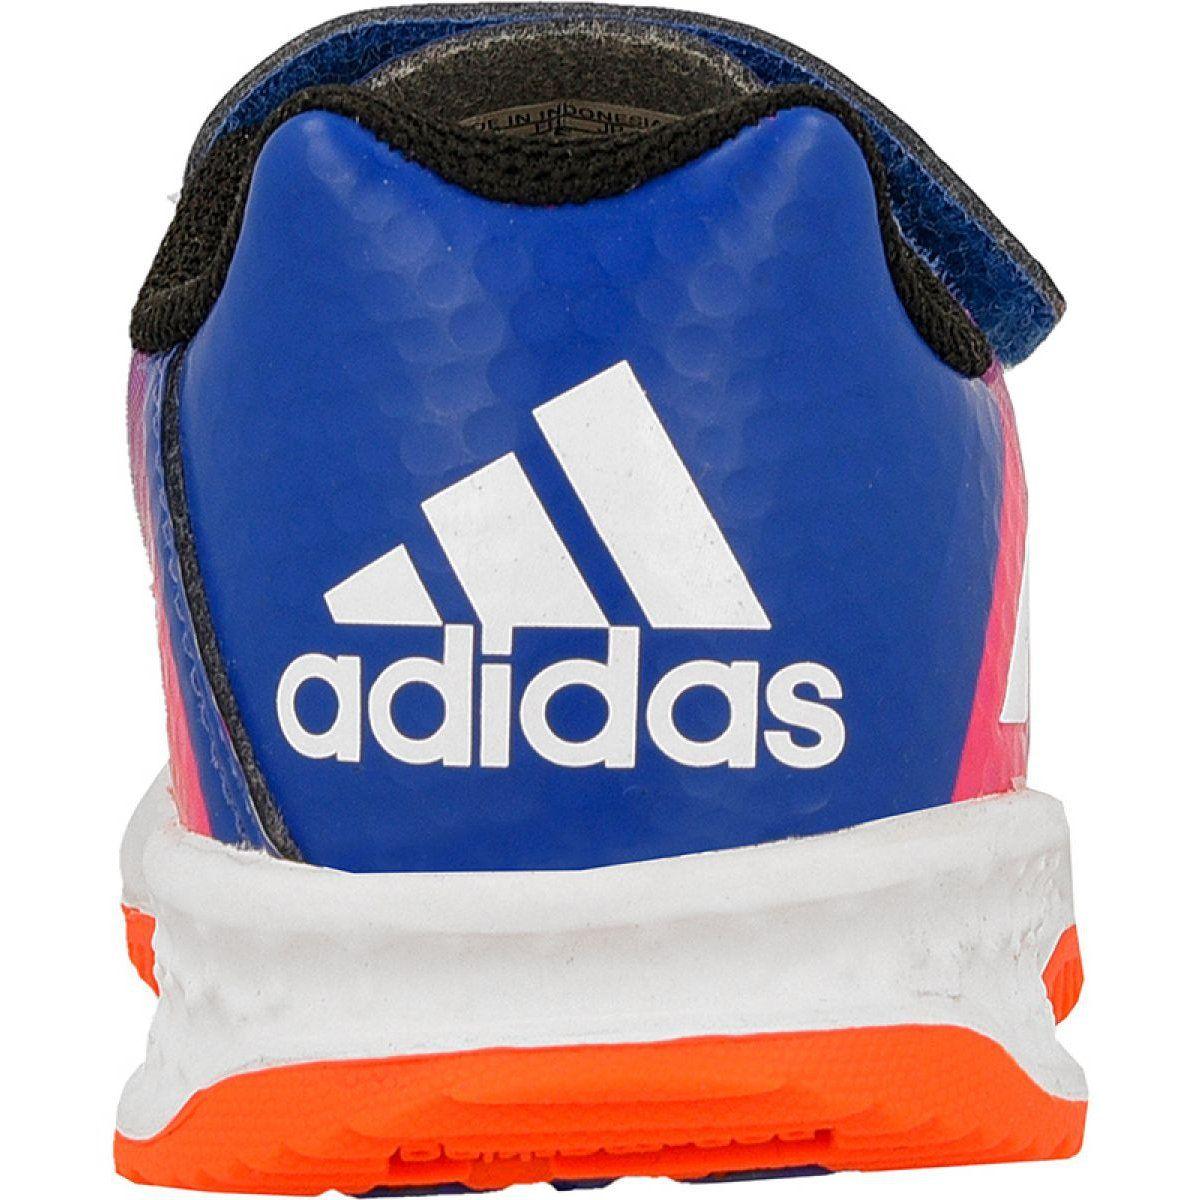 Buty Adidas Rapida Turf Messi Kids Bb0235 Niebieskie Sports Shoes Adidas Blue Shoes Adidas